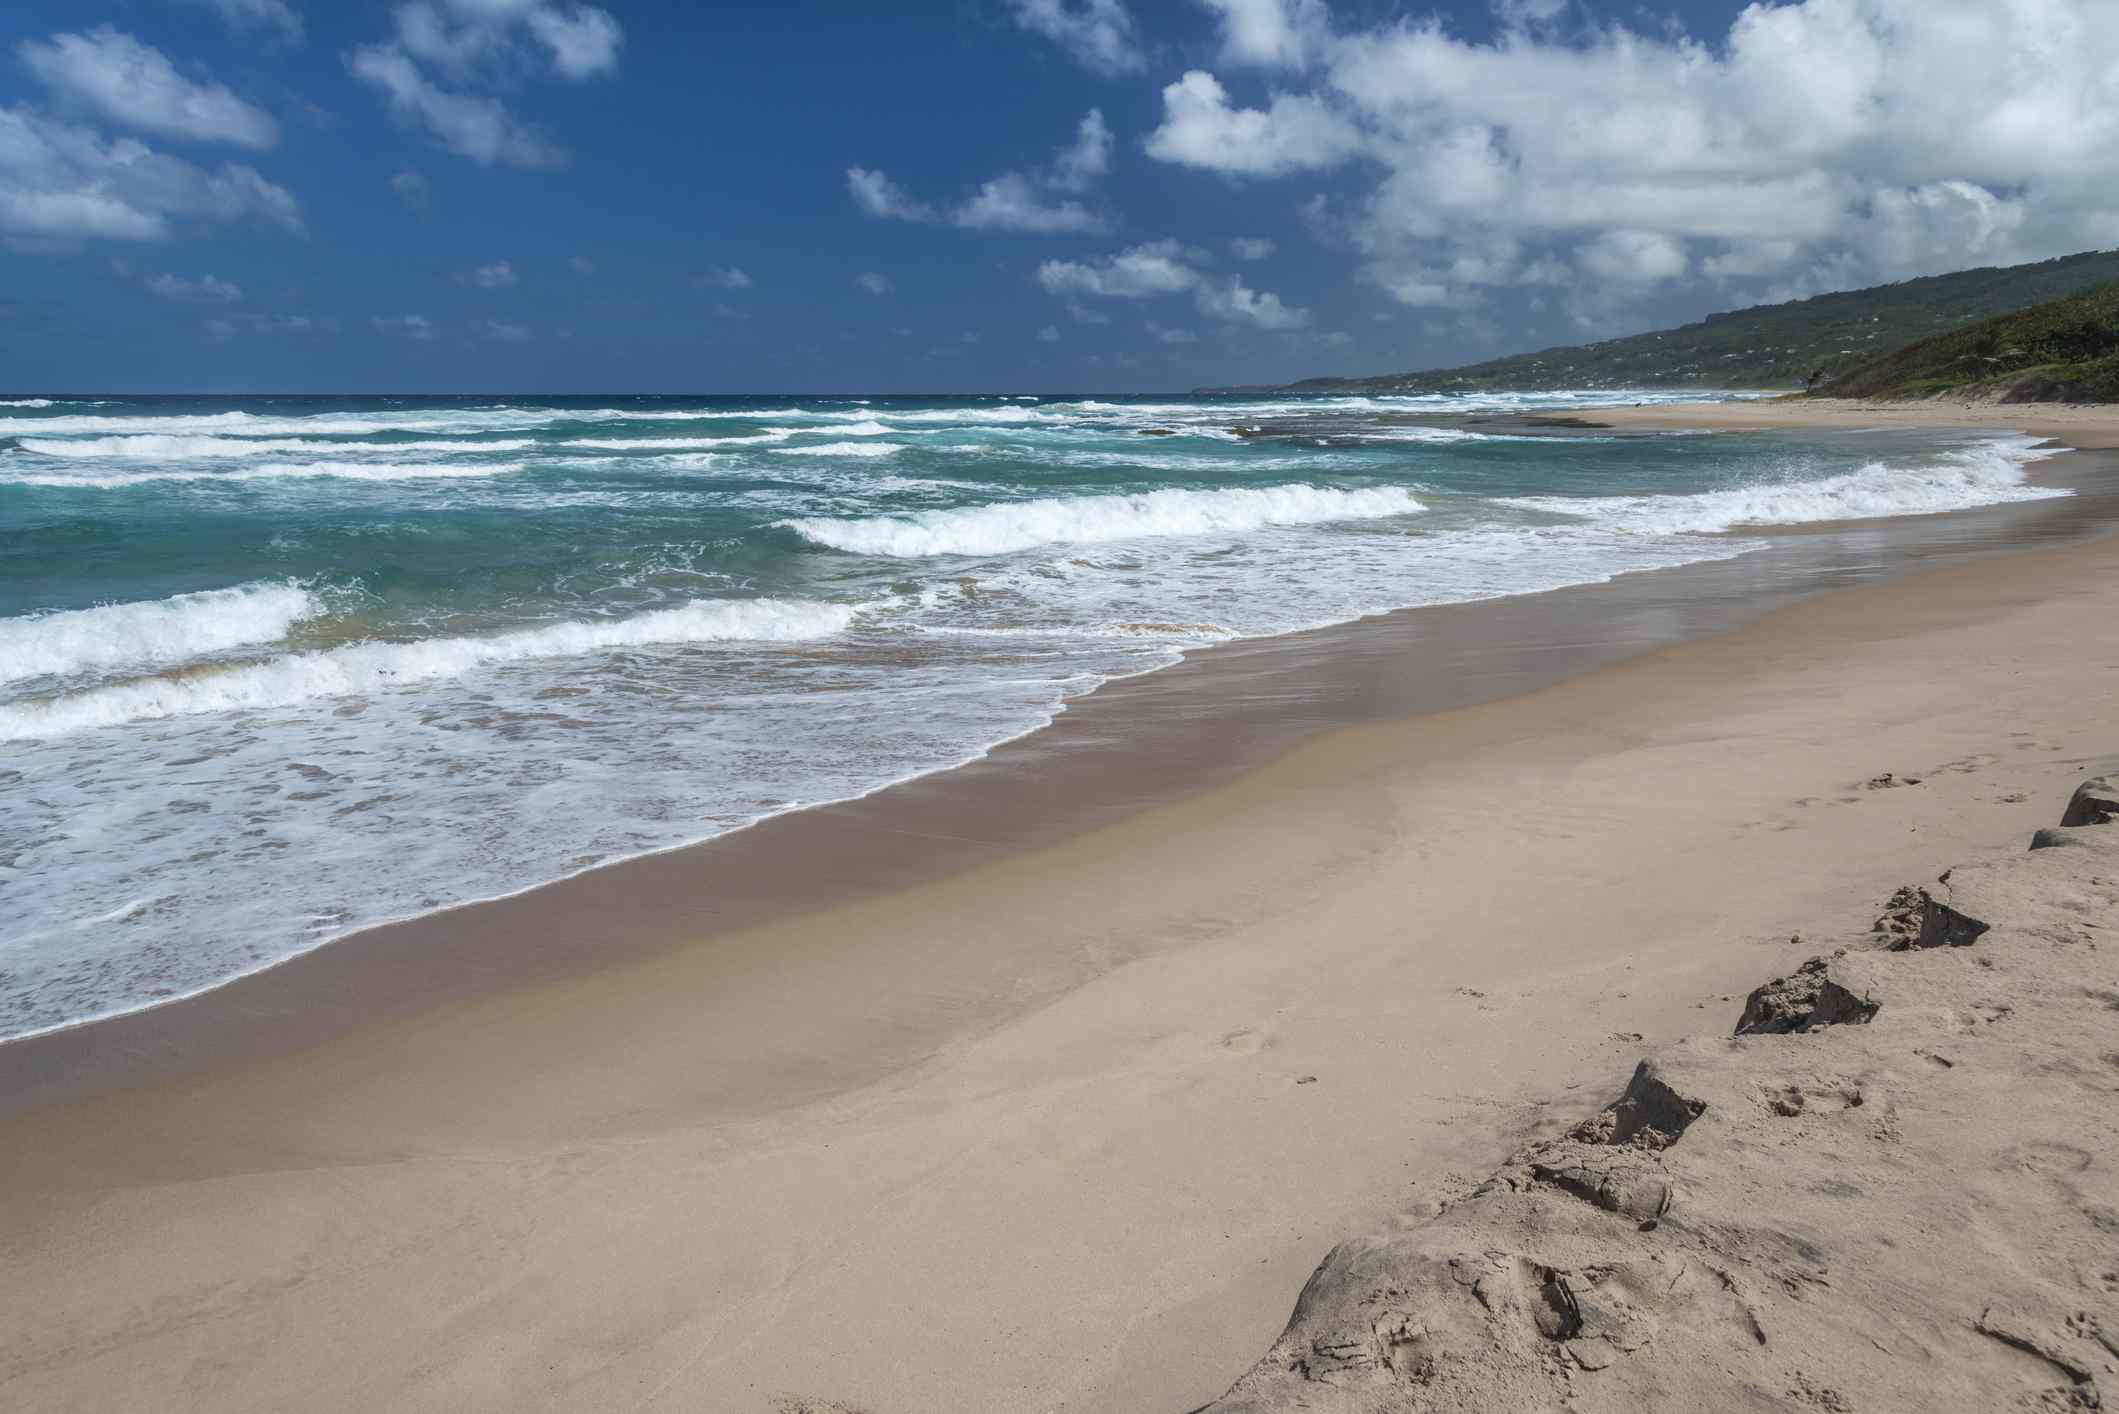 Waves crashing ashore on cattlewash beach